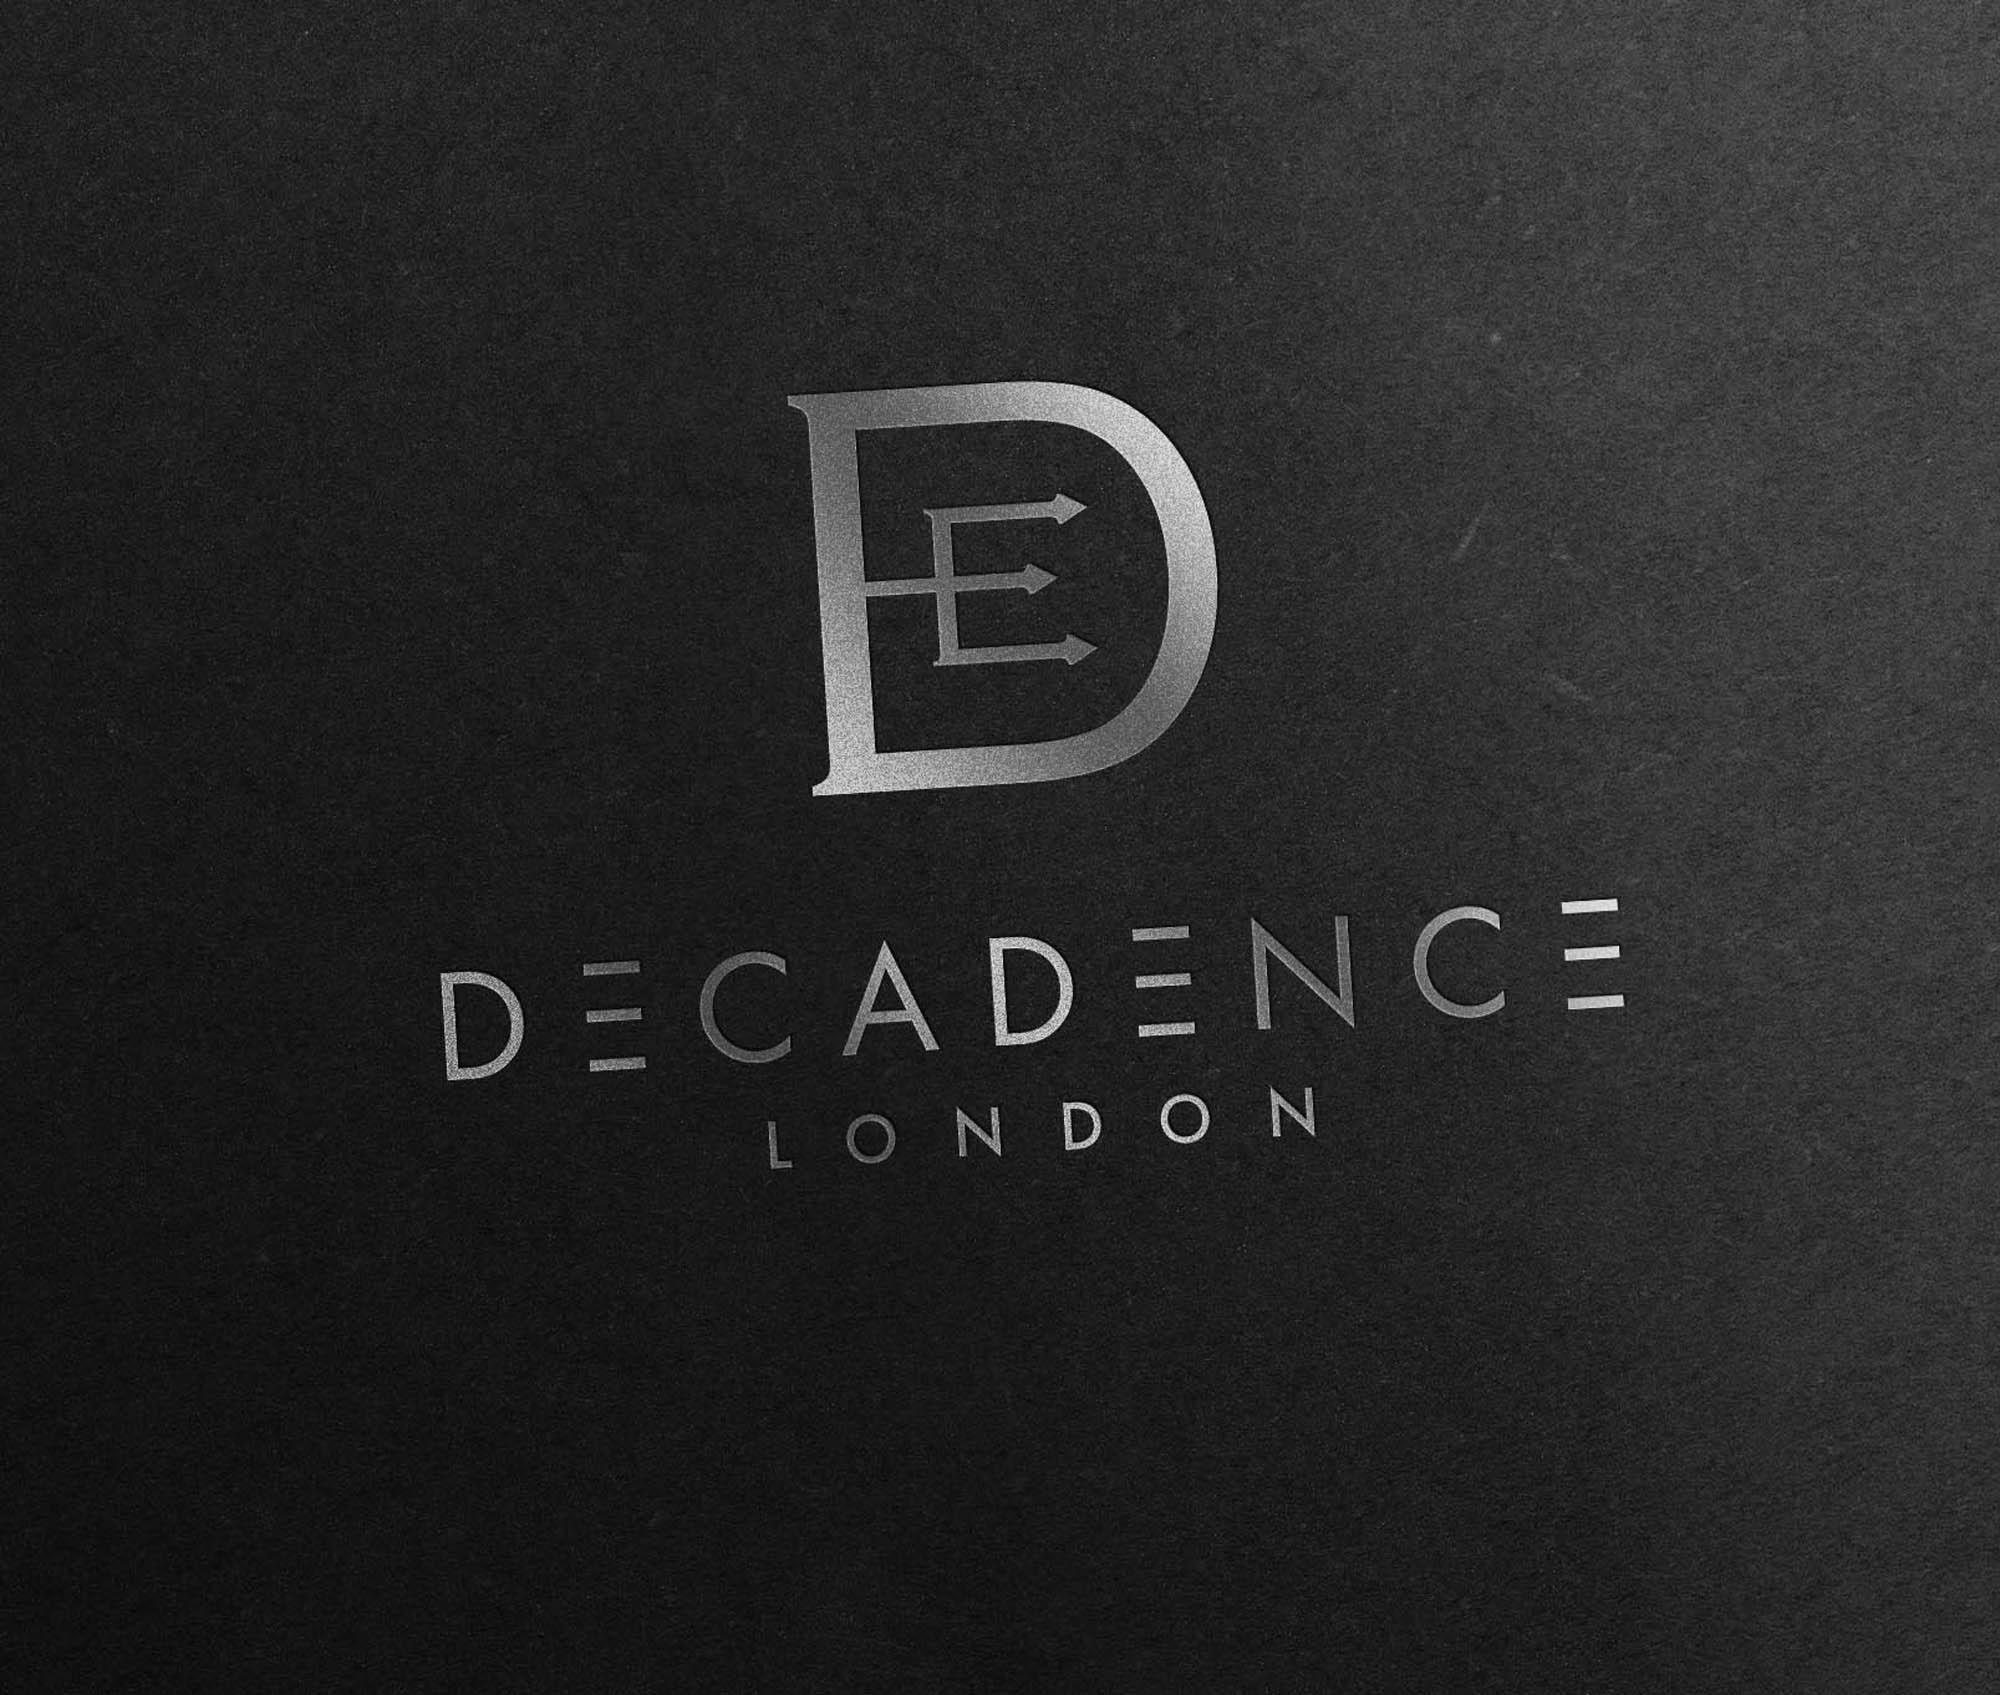 luxury-high-end-clothing-brand-logo-design-london01